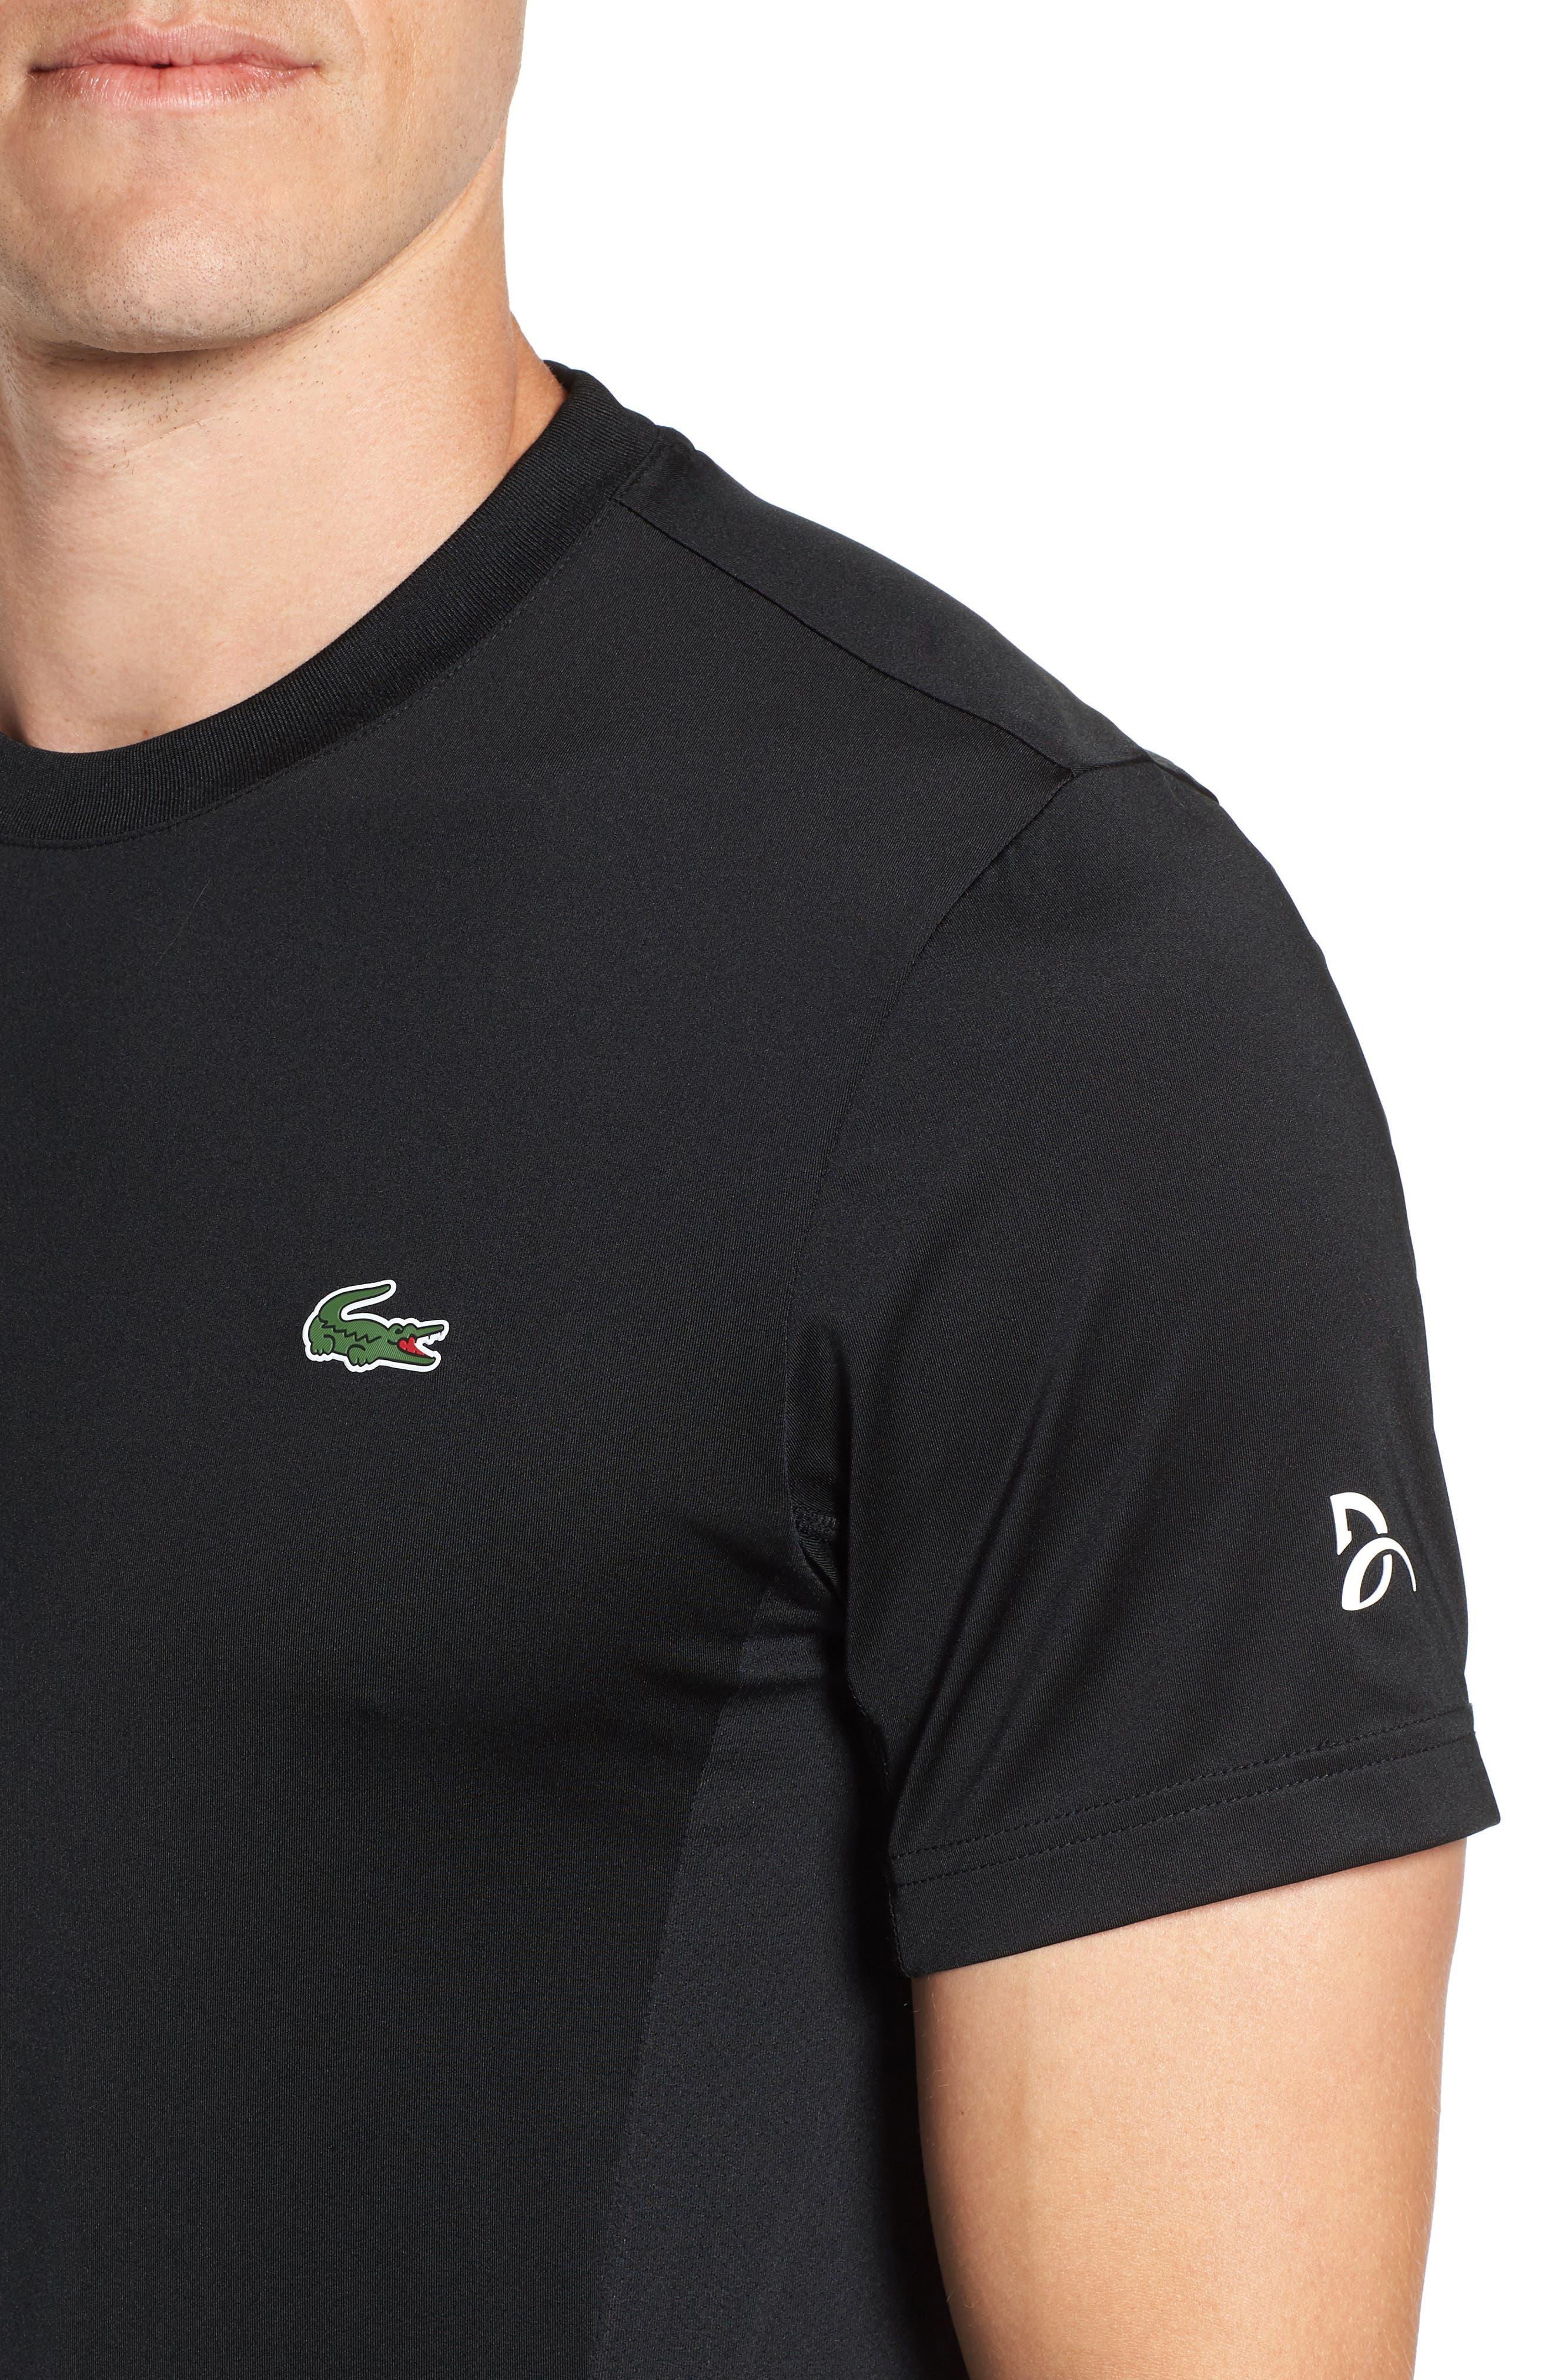 Regular Fit Novak Performance T-Shirt,                             Alternate thumbnail 4, color,                             BLACK/ WHITE